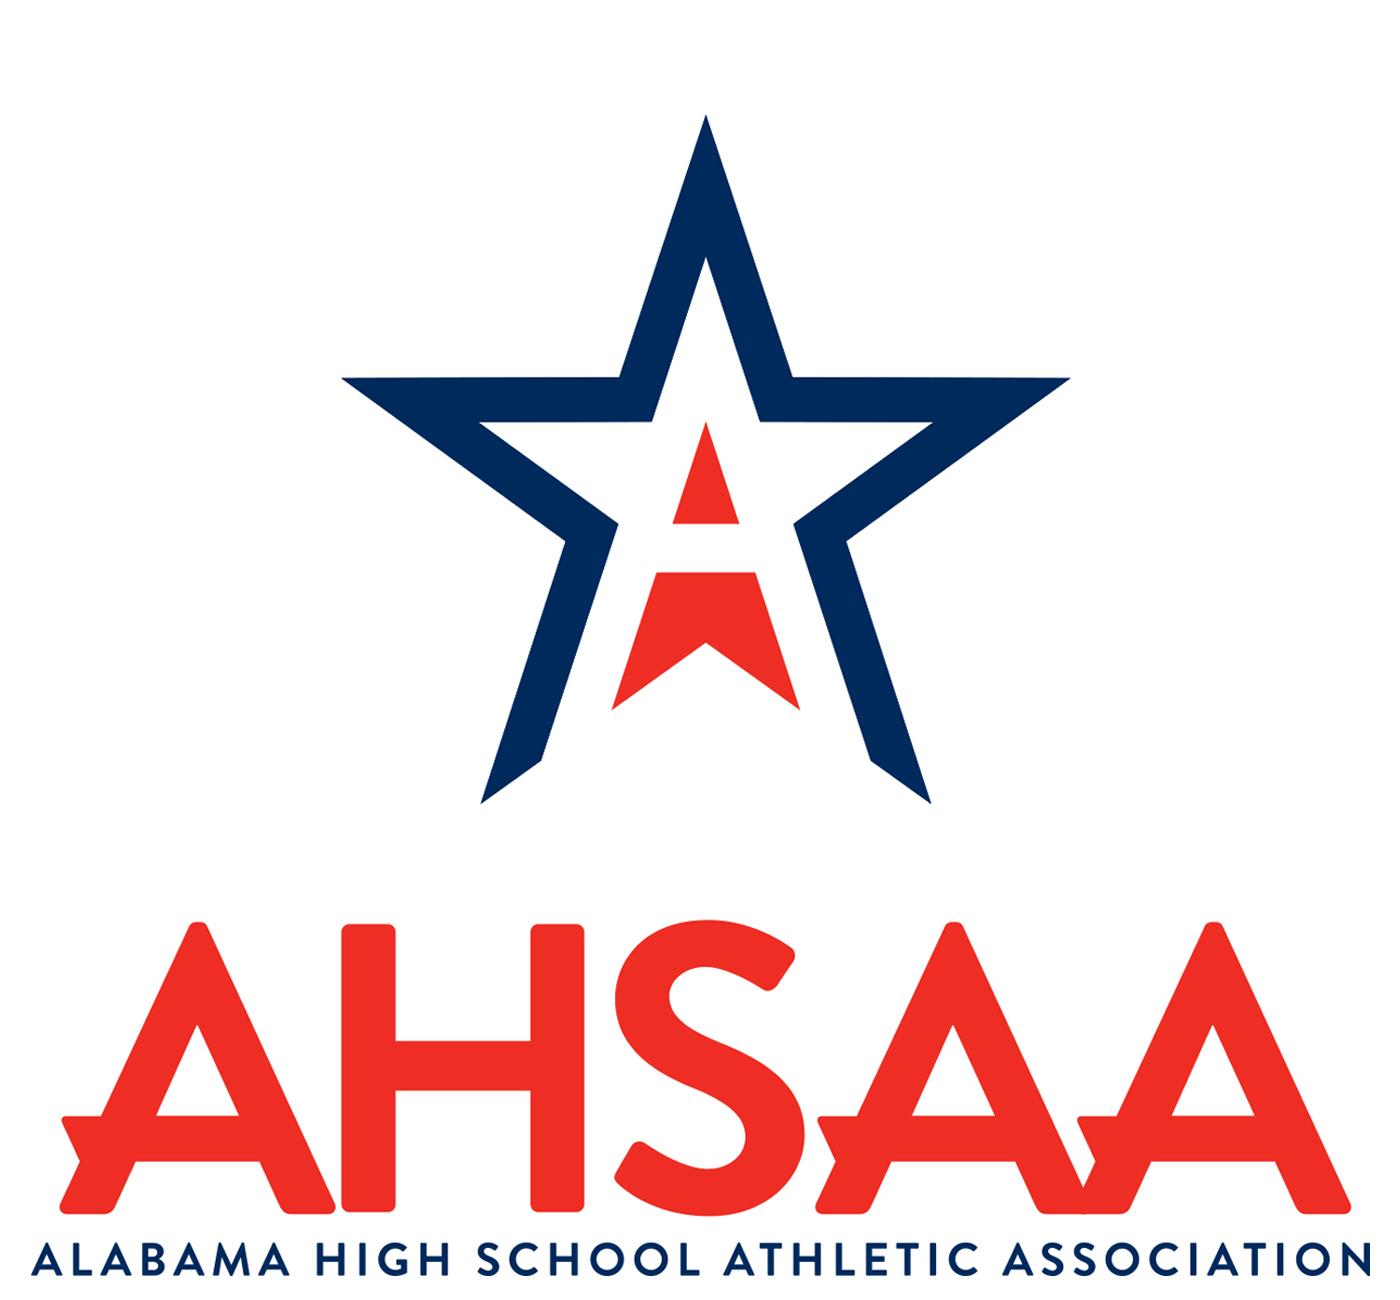 AHSAA Mourns the Death of High School Officiating Legend Hugh Dan Gunter